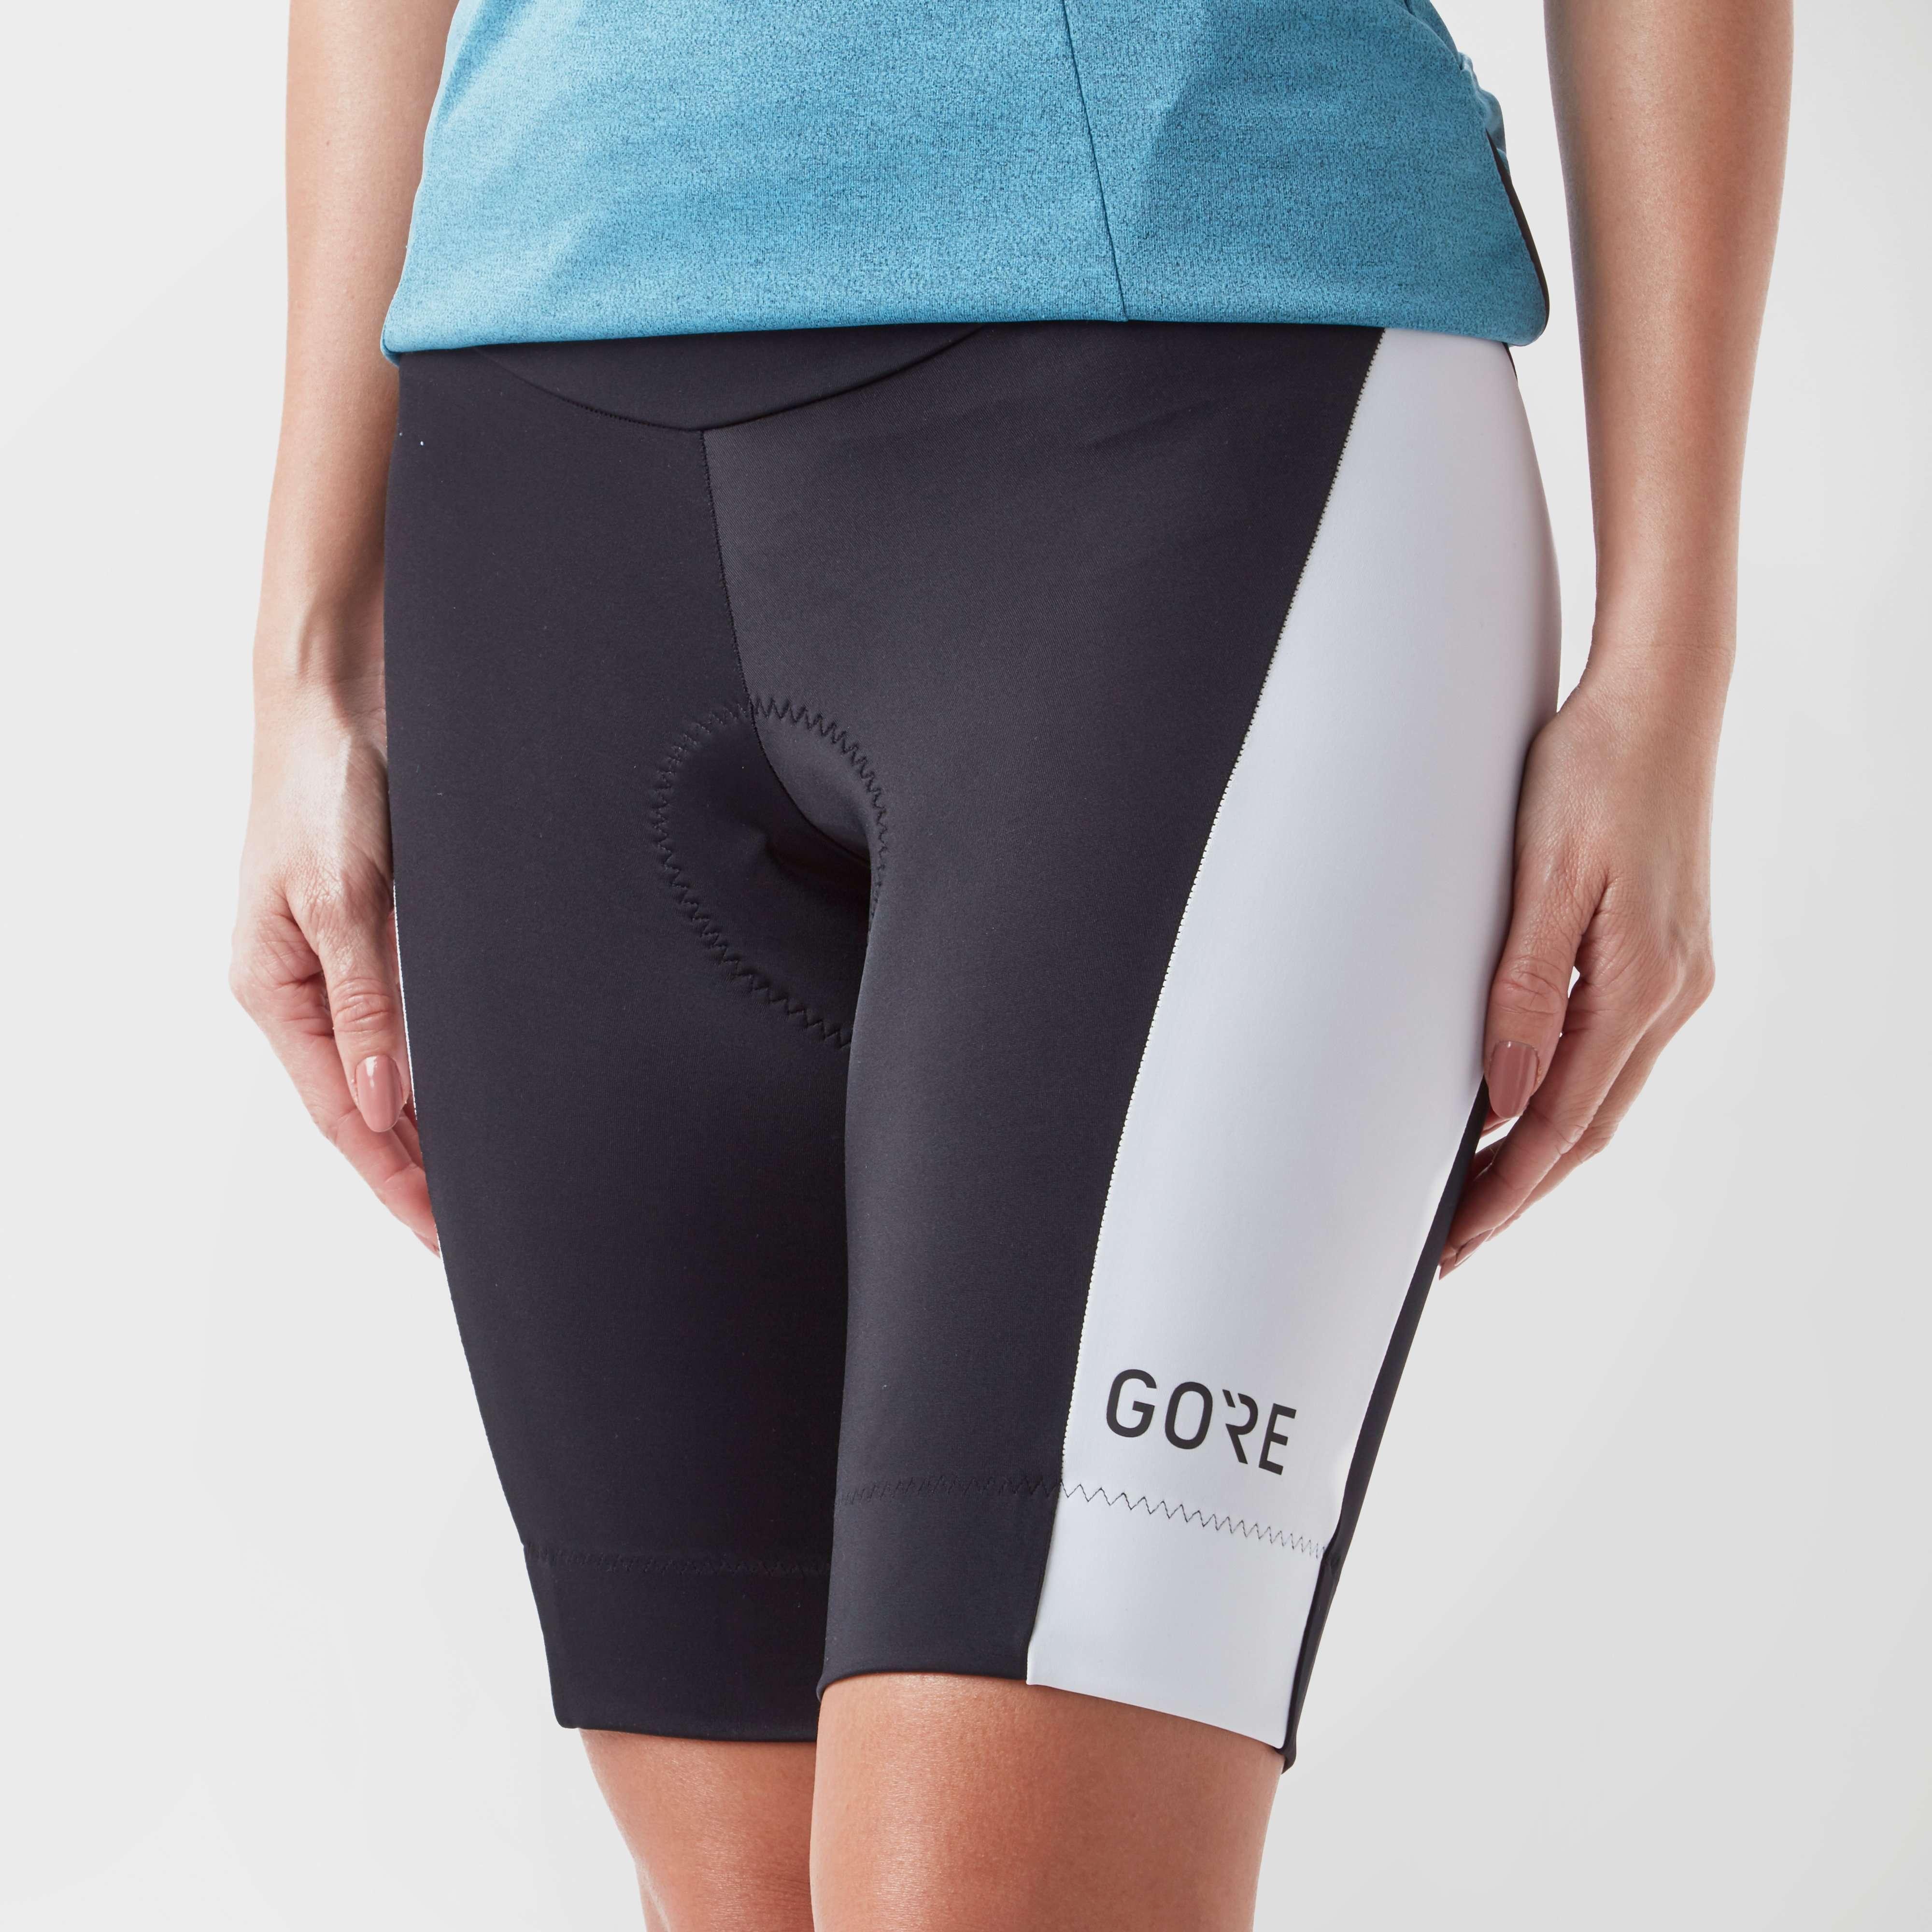 GORE Women's C3 Short Tights+